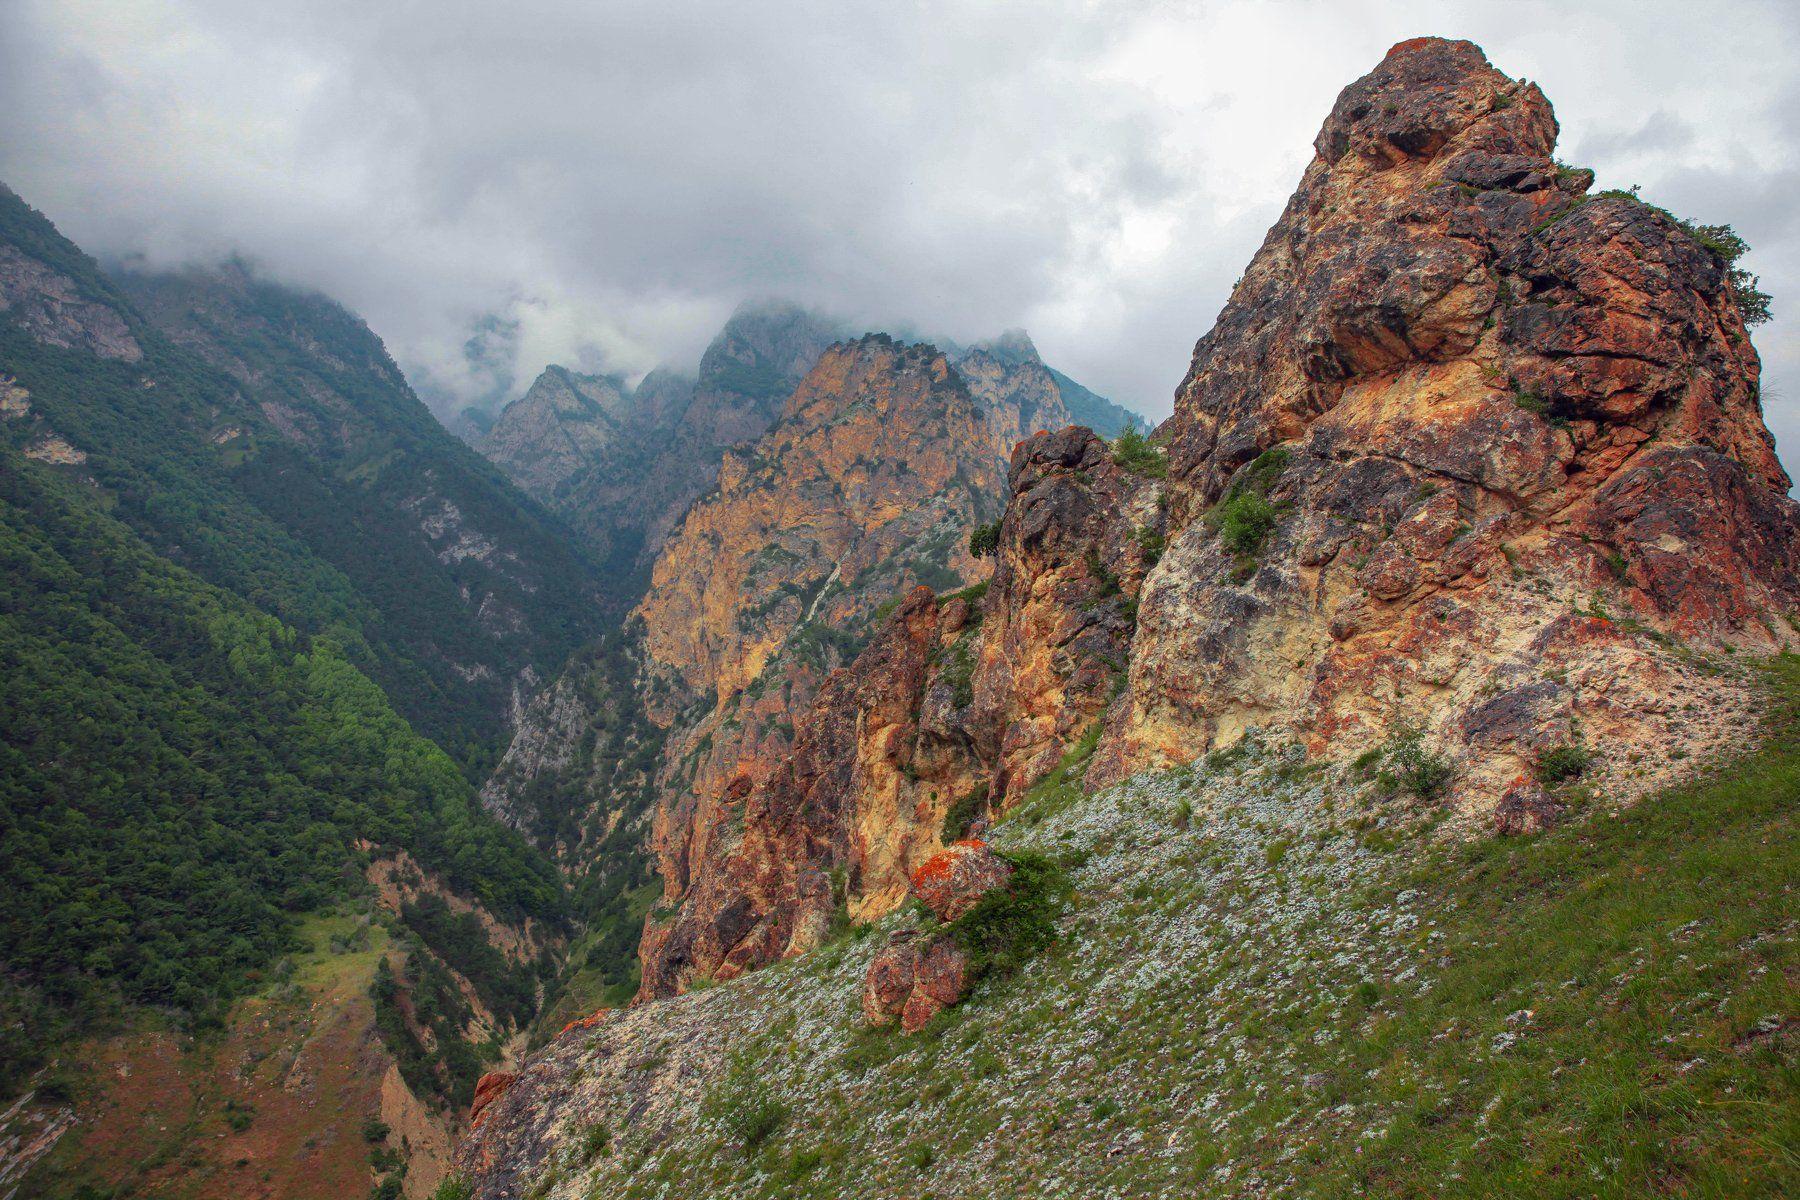 чегем,природа,горы,ущелье,кбр.балкария,кабардино балкария,кавказ,северный кавказ,лето., Magov Marat